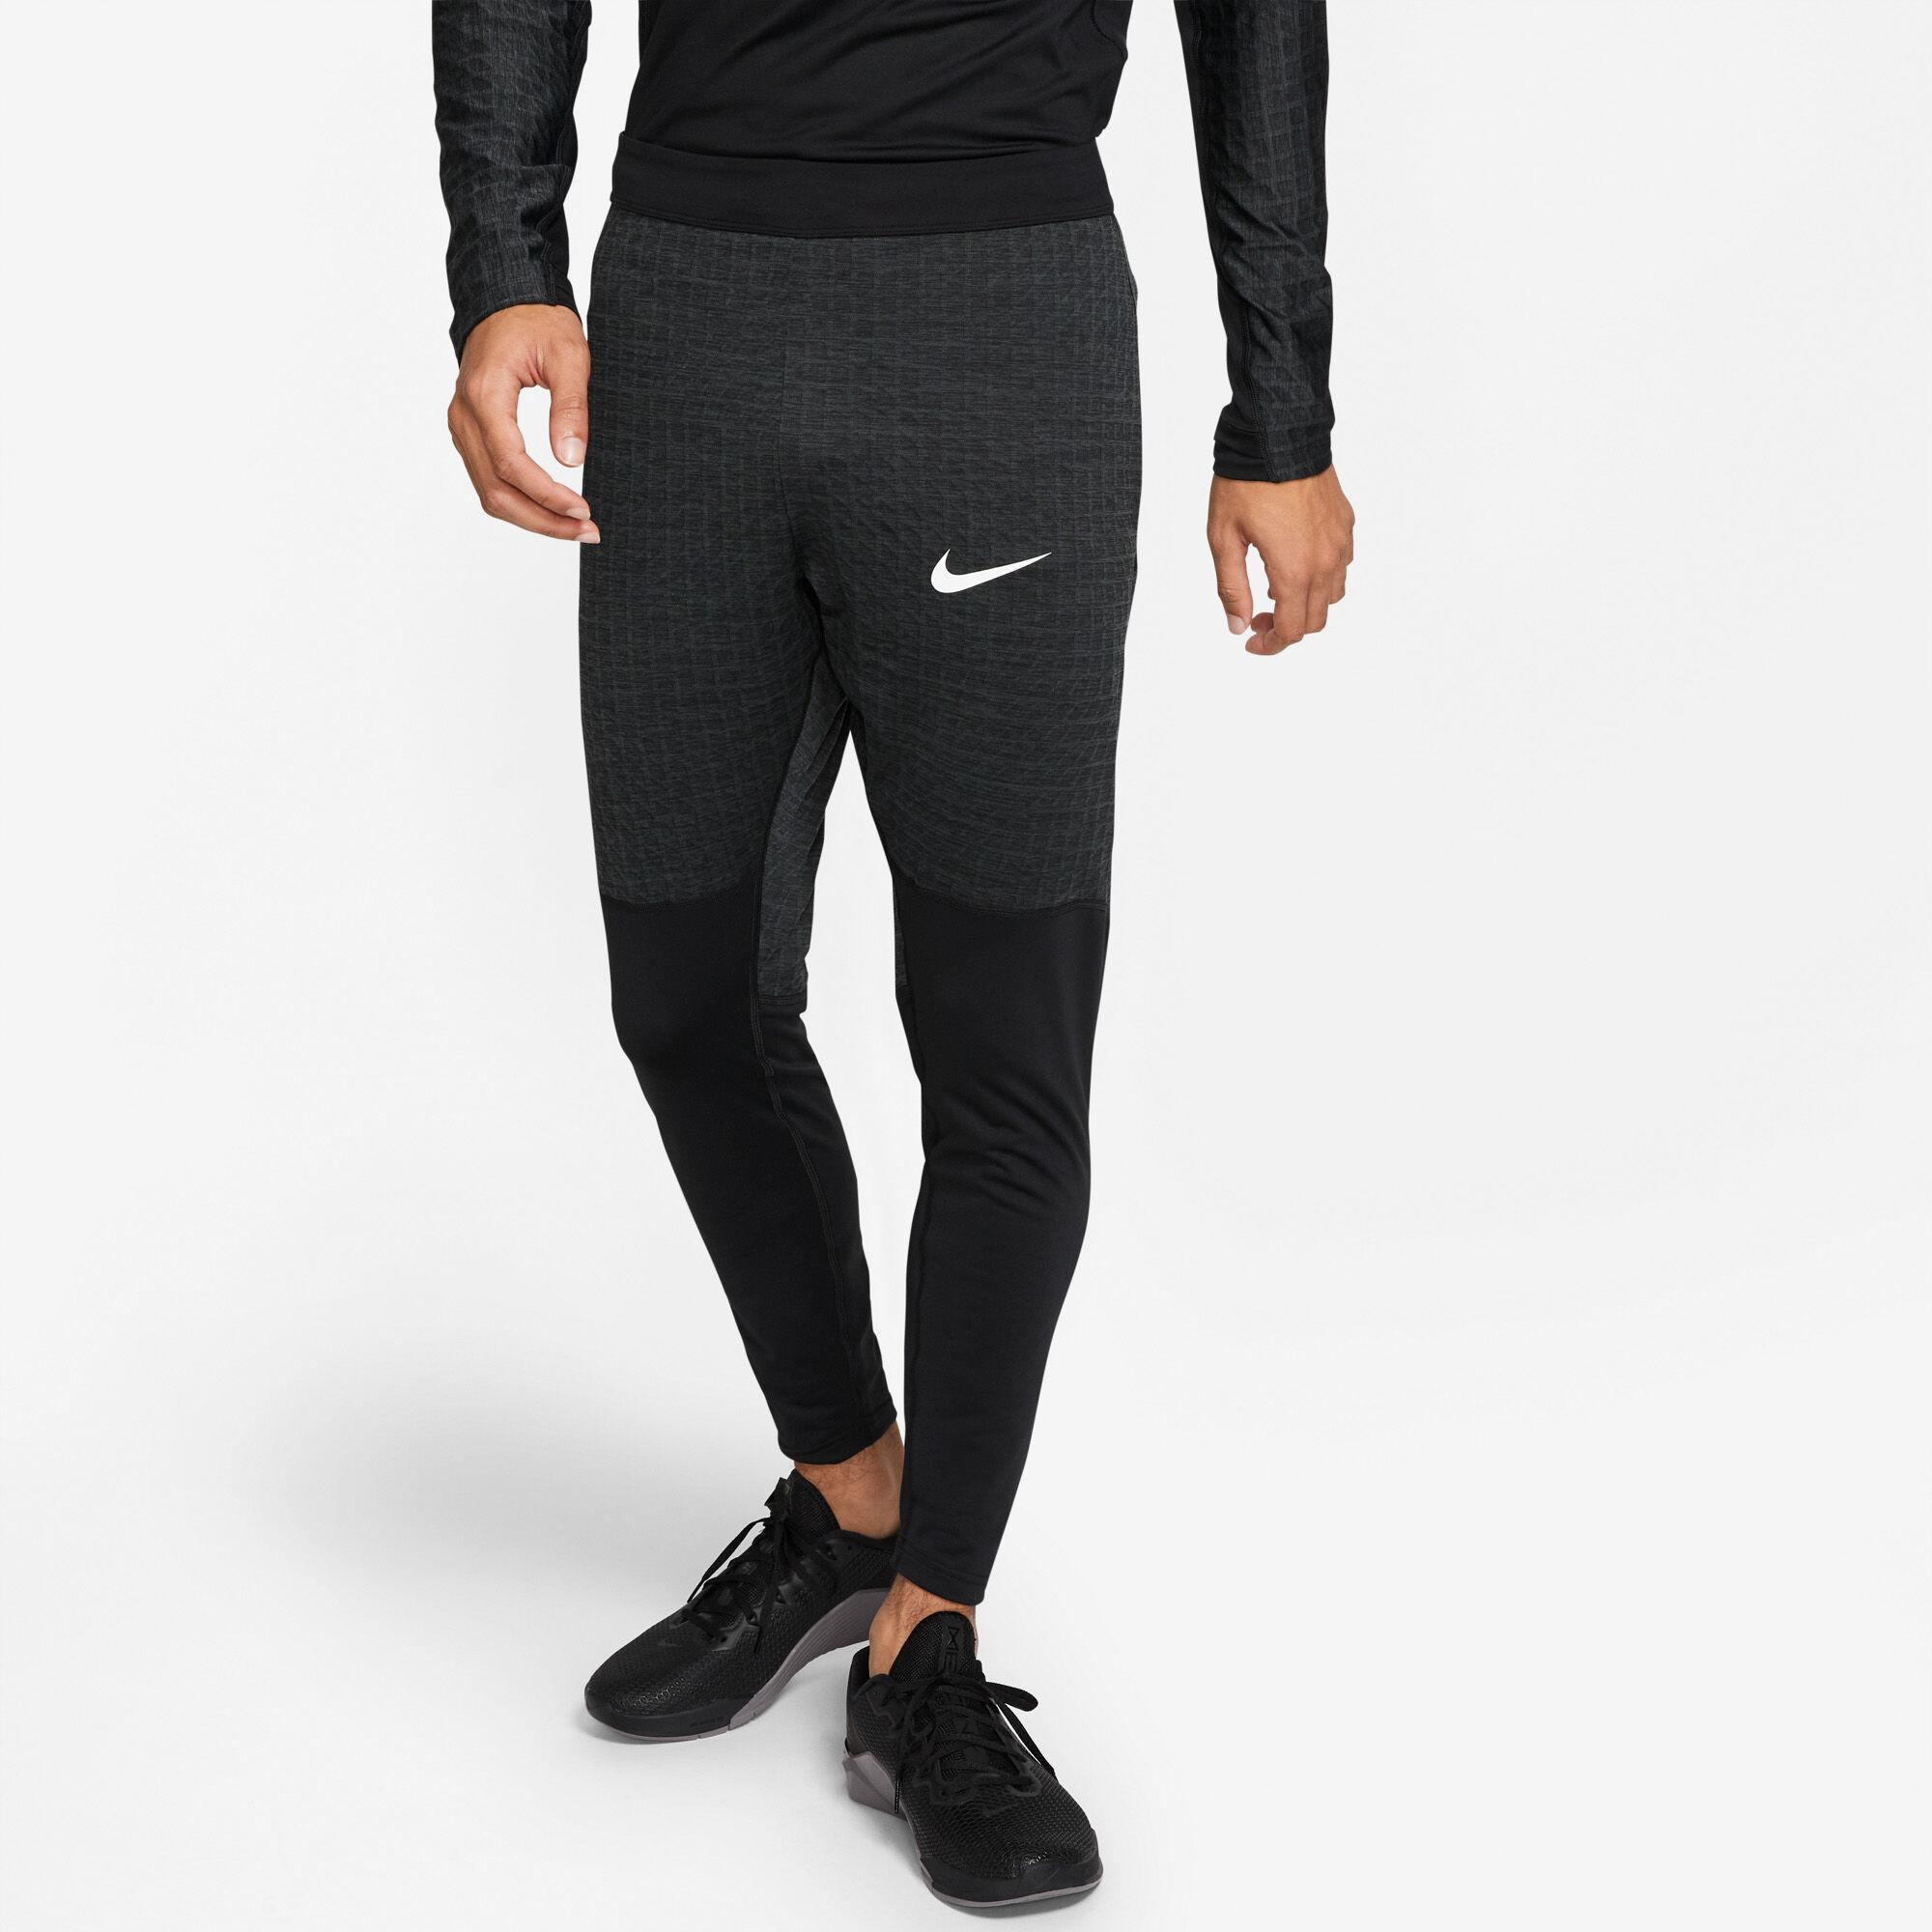 Hose Nike M NP TGHT UTILITY THRMA